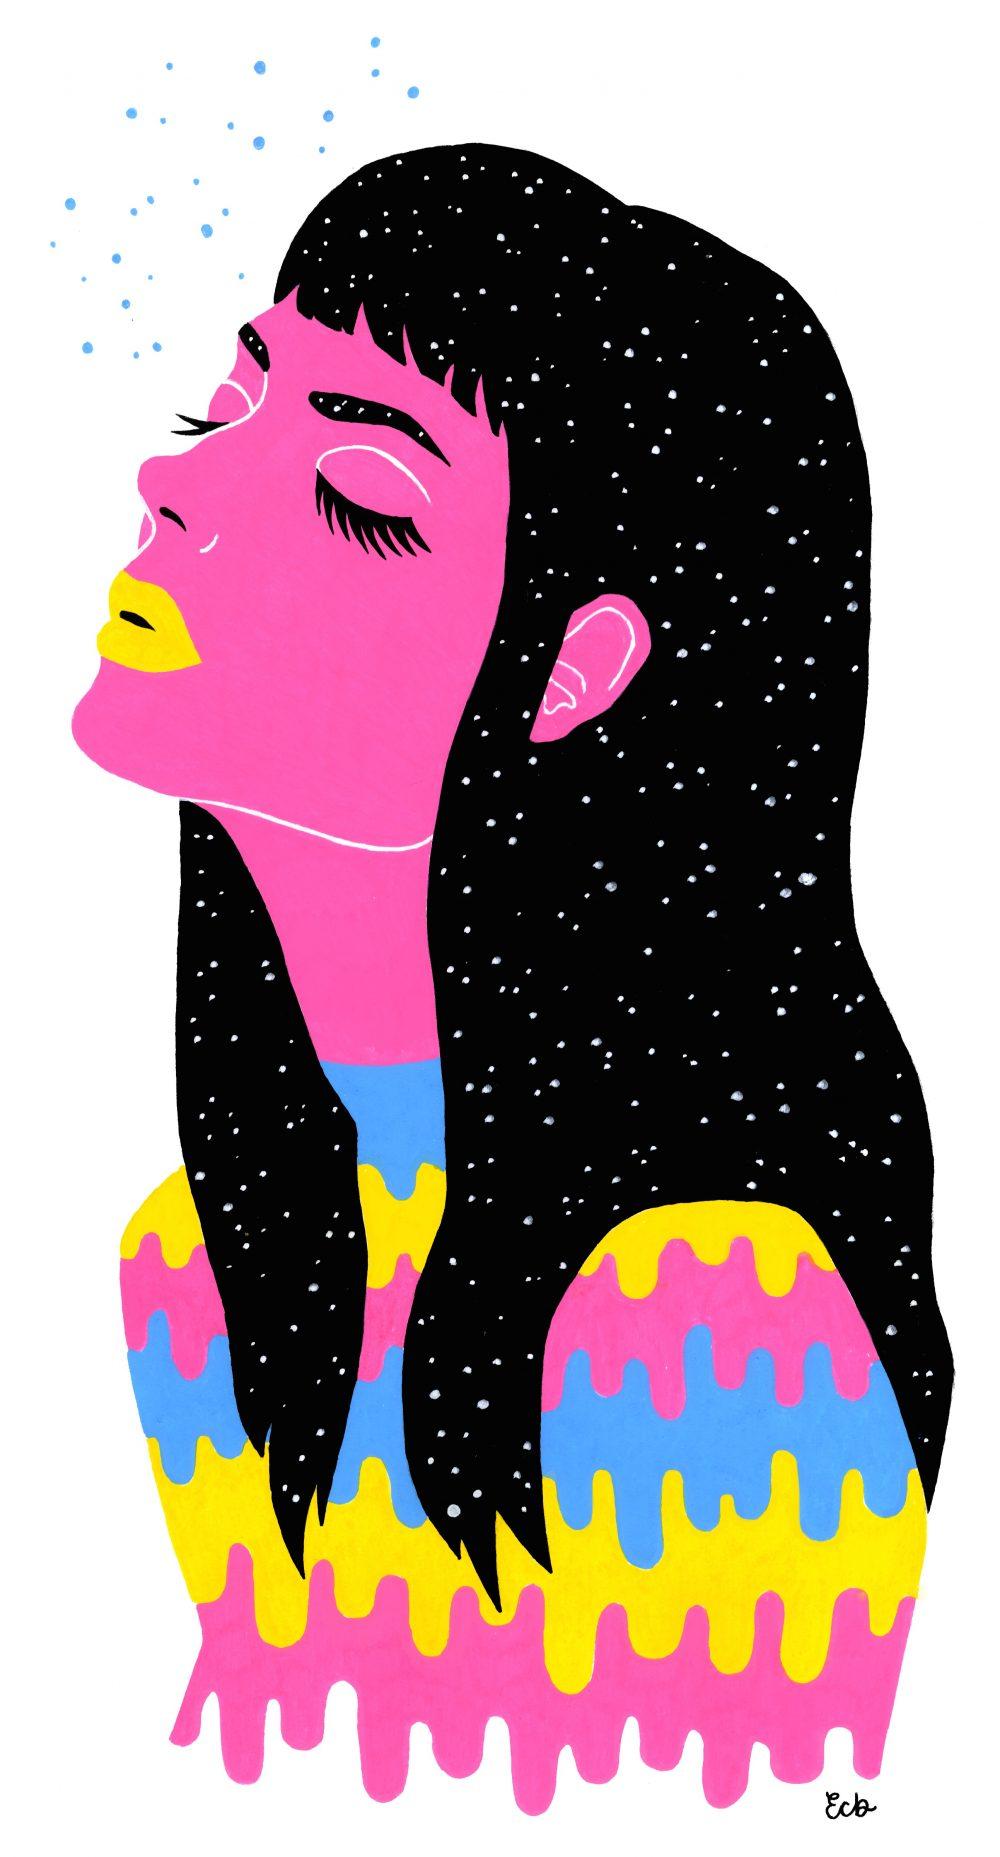 BA (Hons) Fashion Illustration student Emily Brinkley.